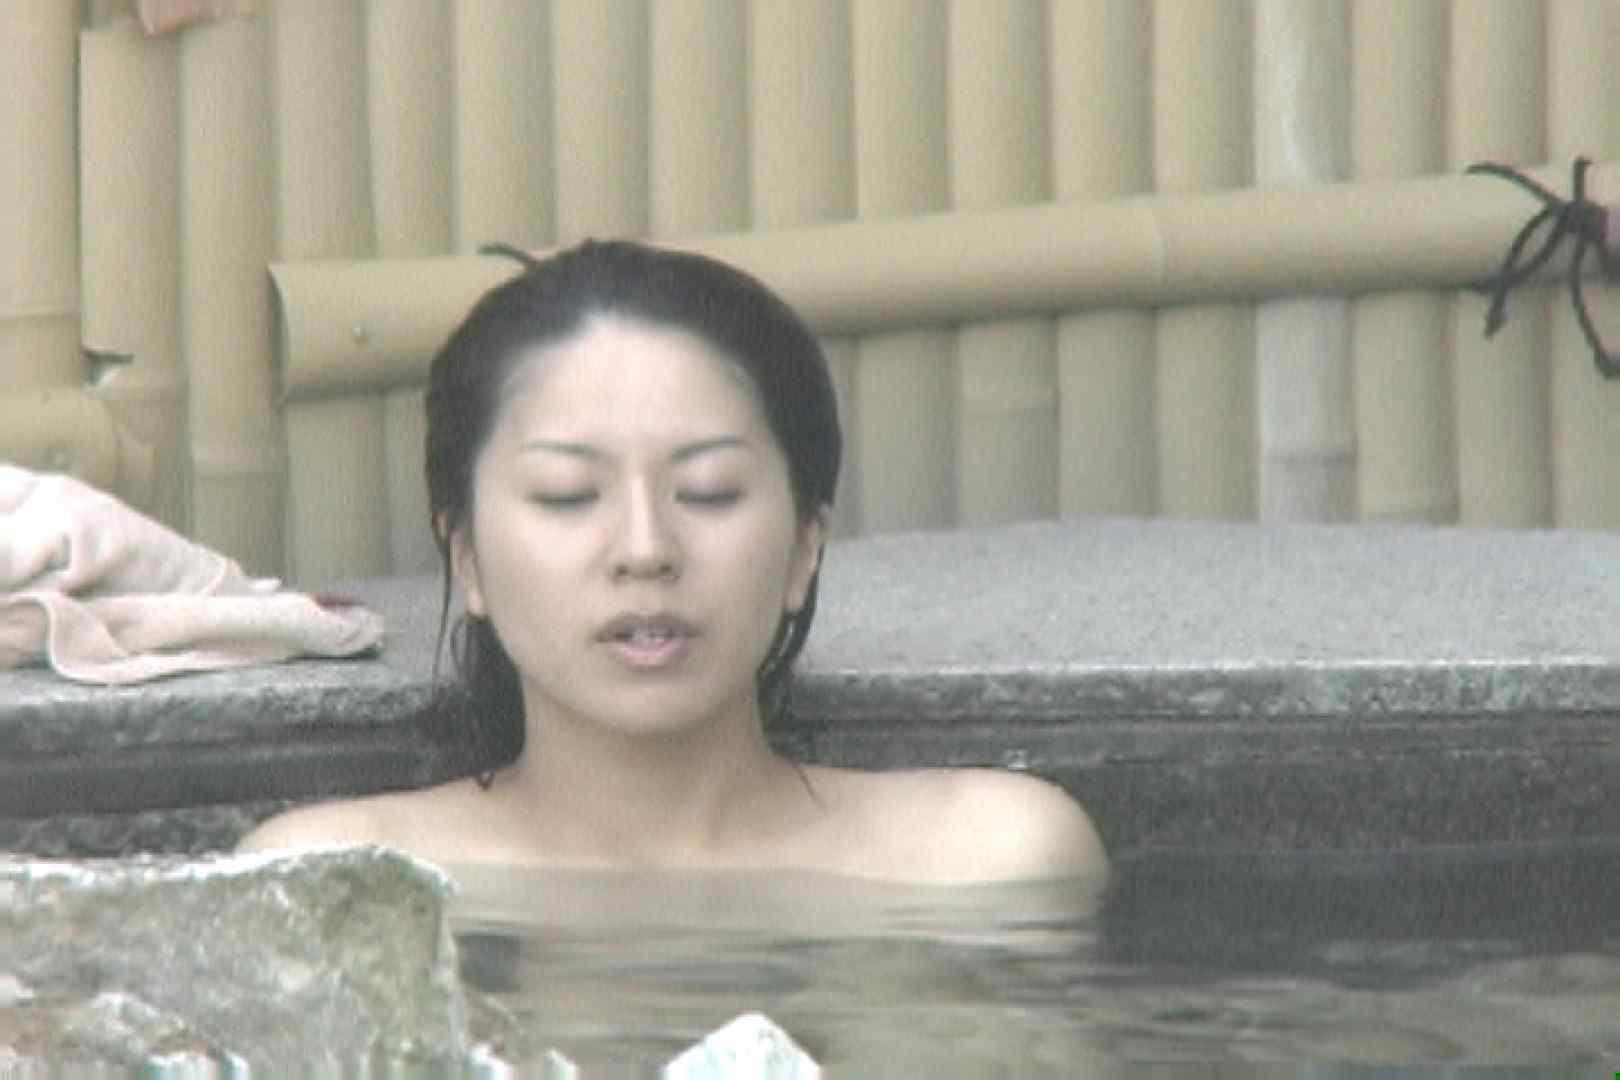 Aquaな露天風呂Vol.694 露天 | OLセックス  67画像 16